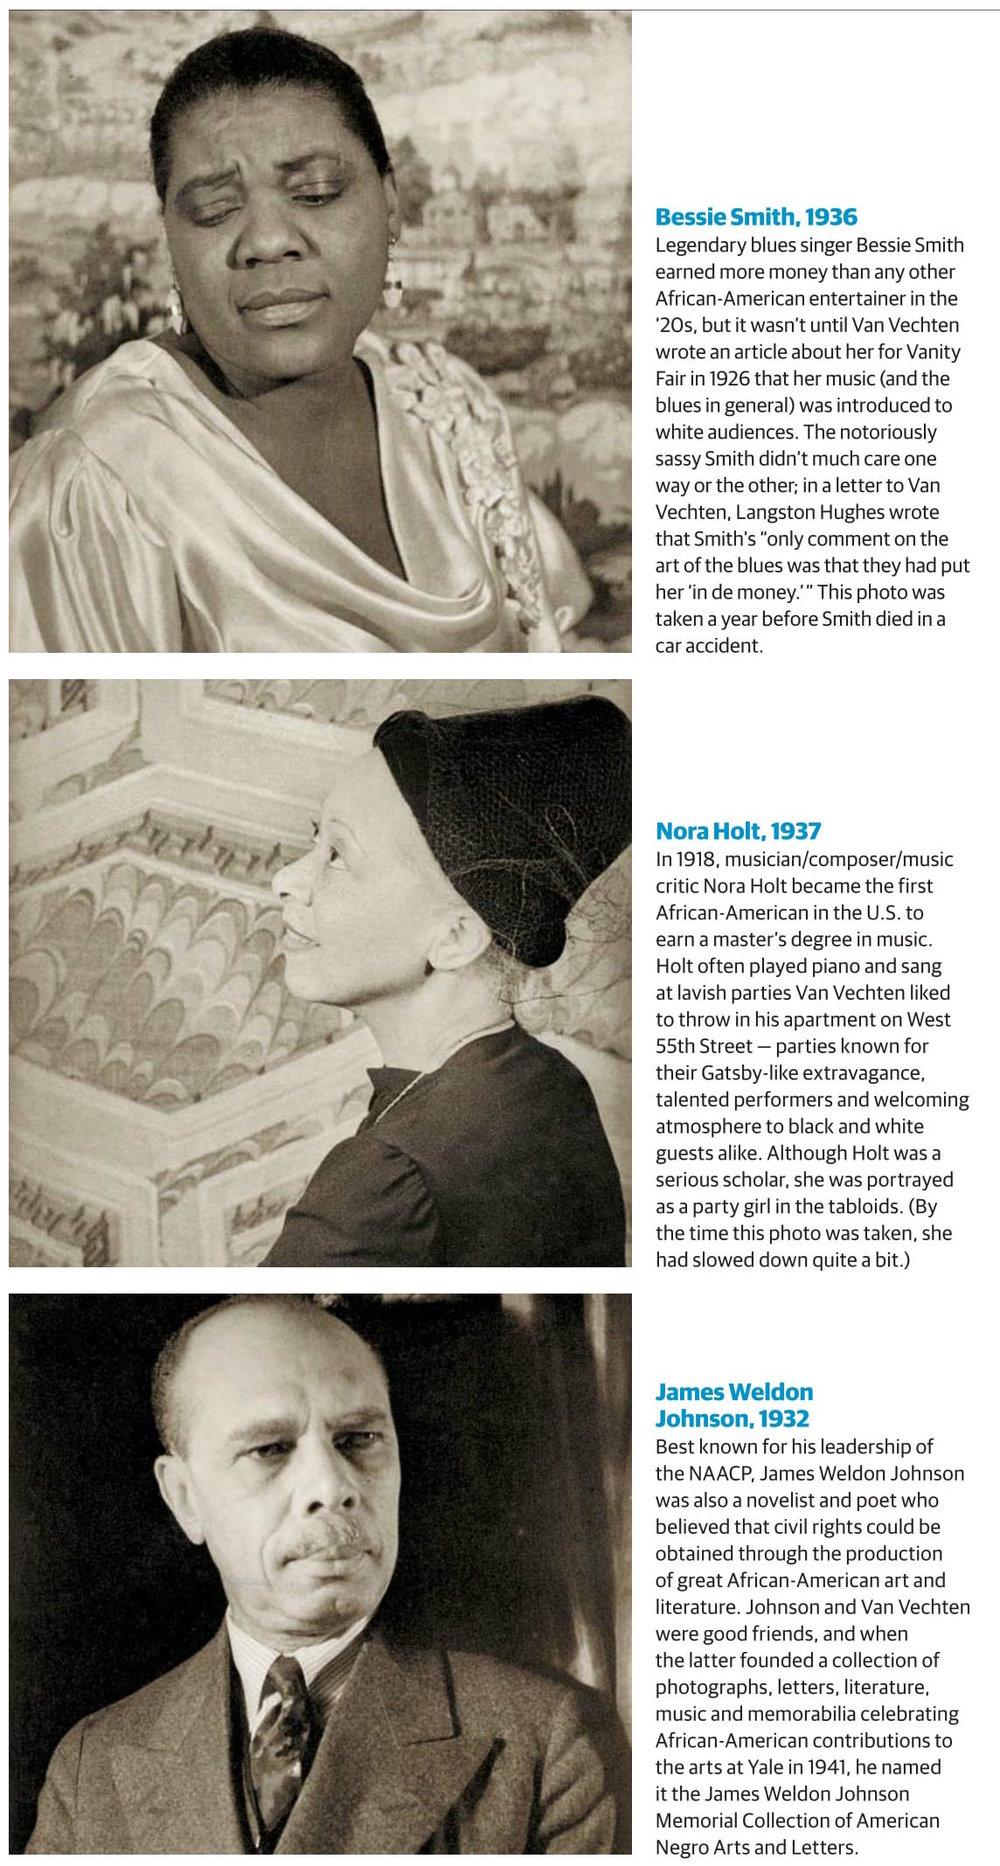 https://www.washingtonpost.com/express/wp/2016/09/01/bon-vivant-carl-van-vechten-photographed-his-good-friends-harlems-legendary-artists